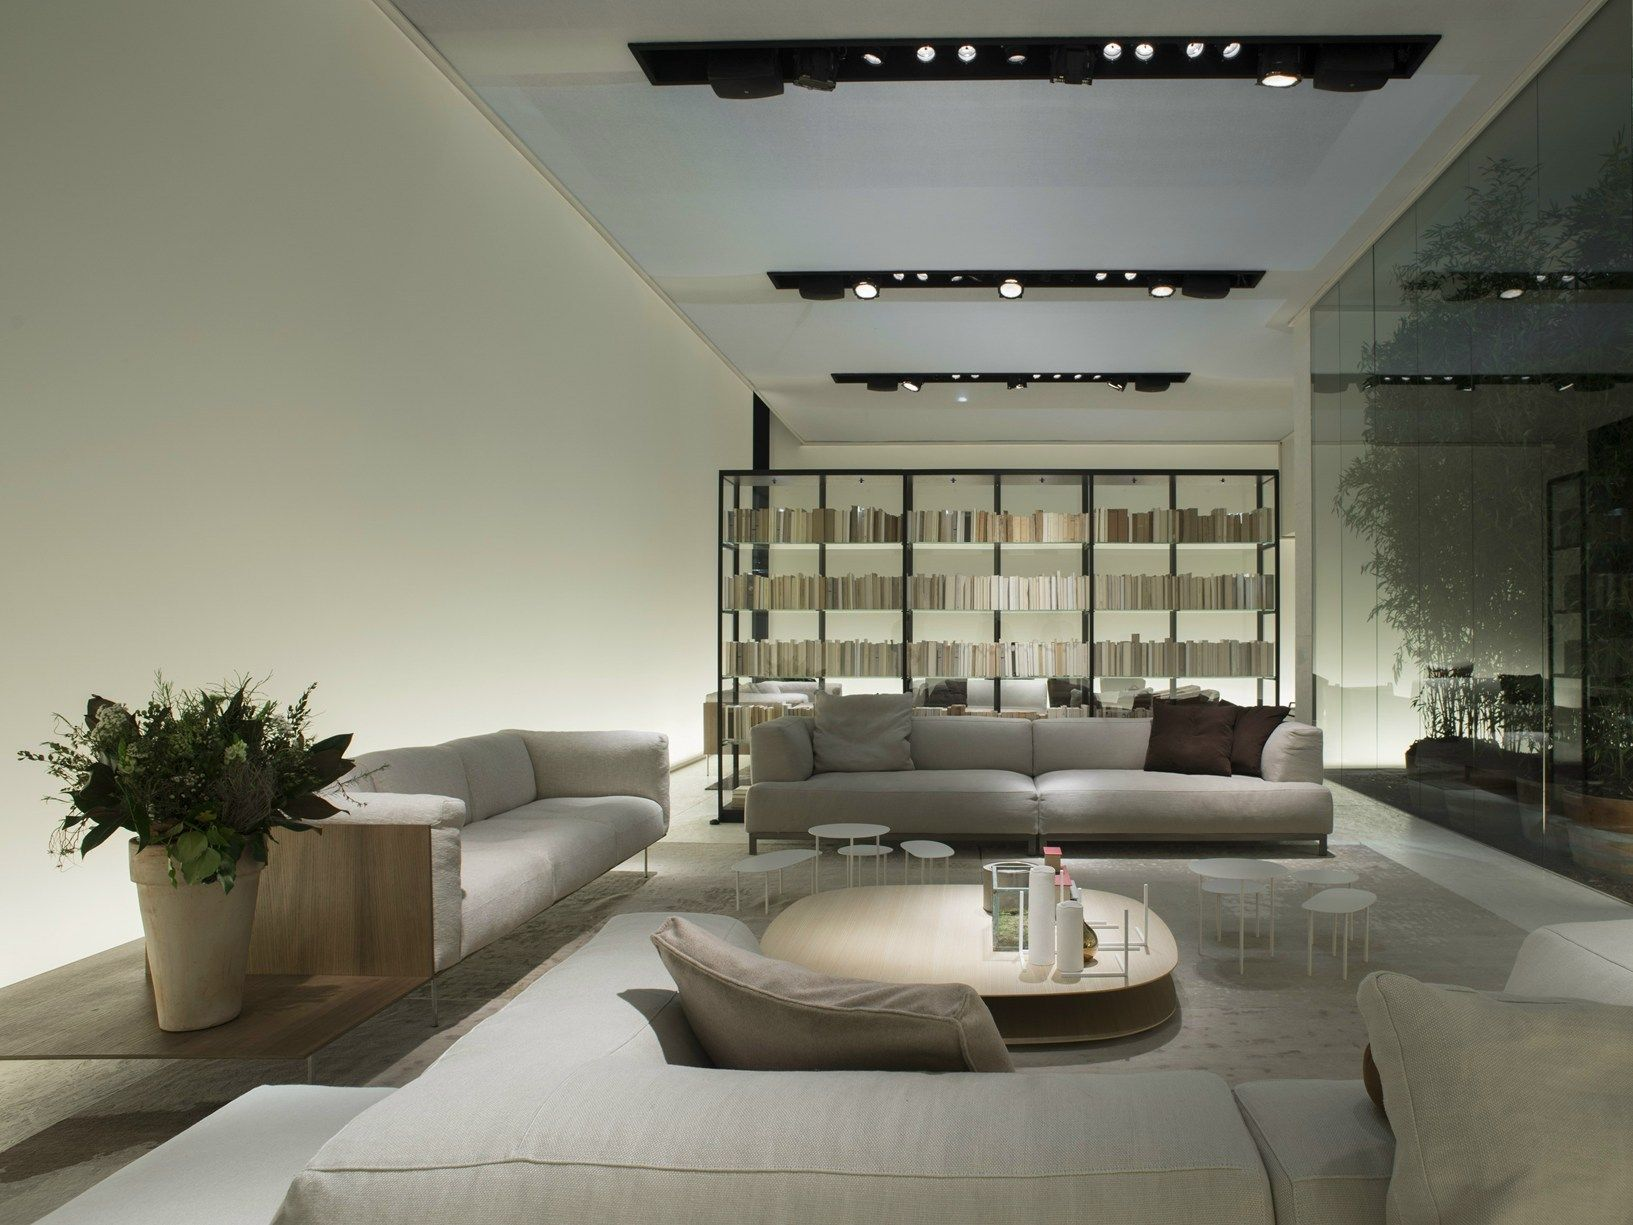 Living divani comfort sofisticato : Living divani a imm cologne